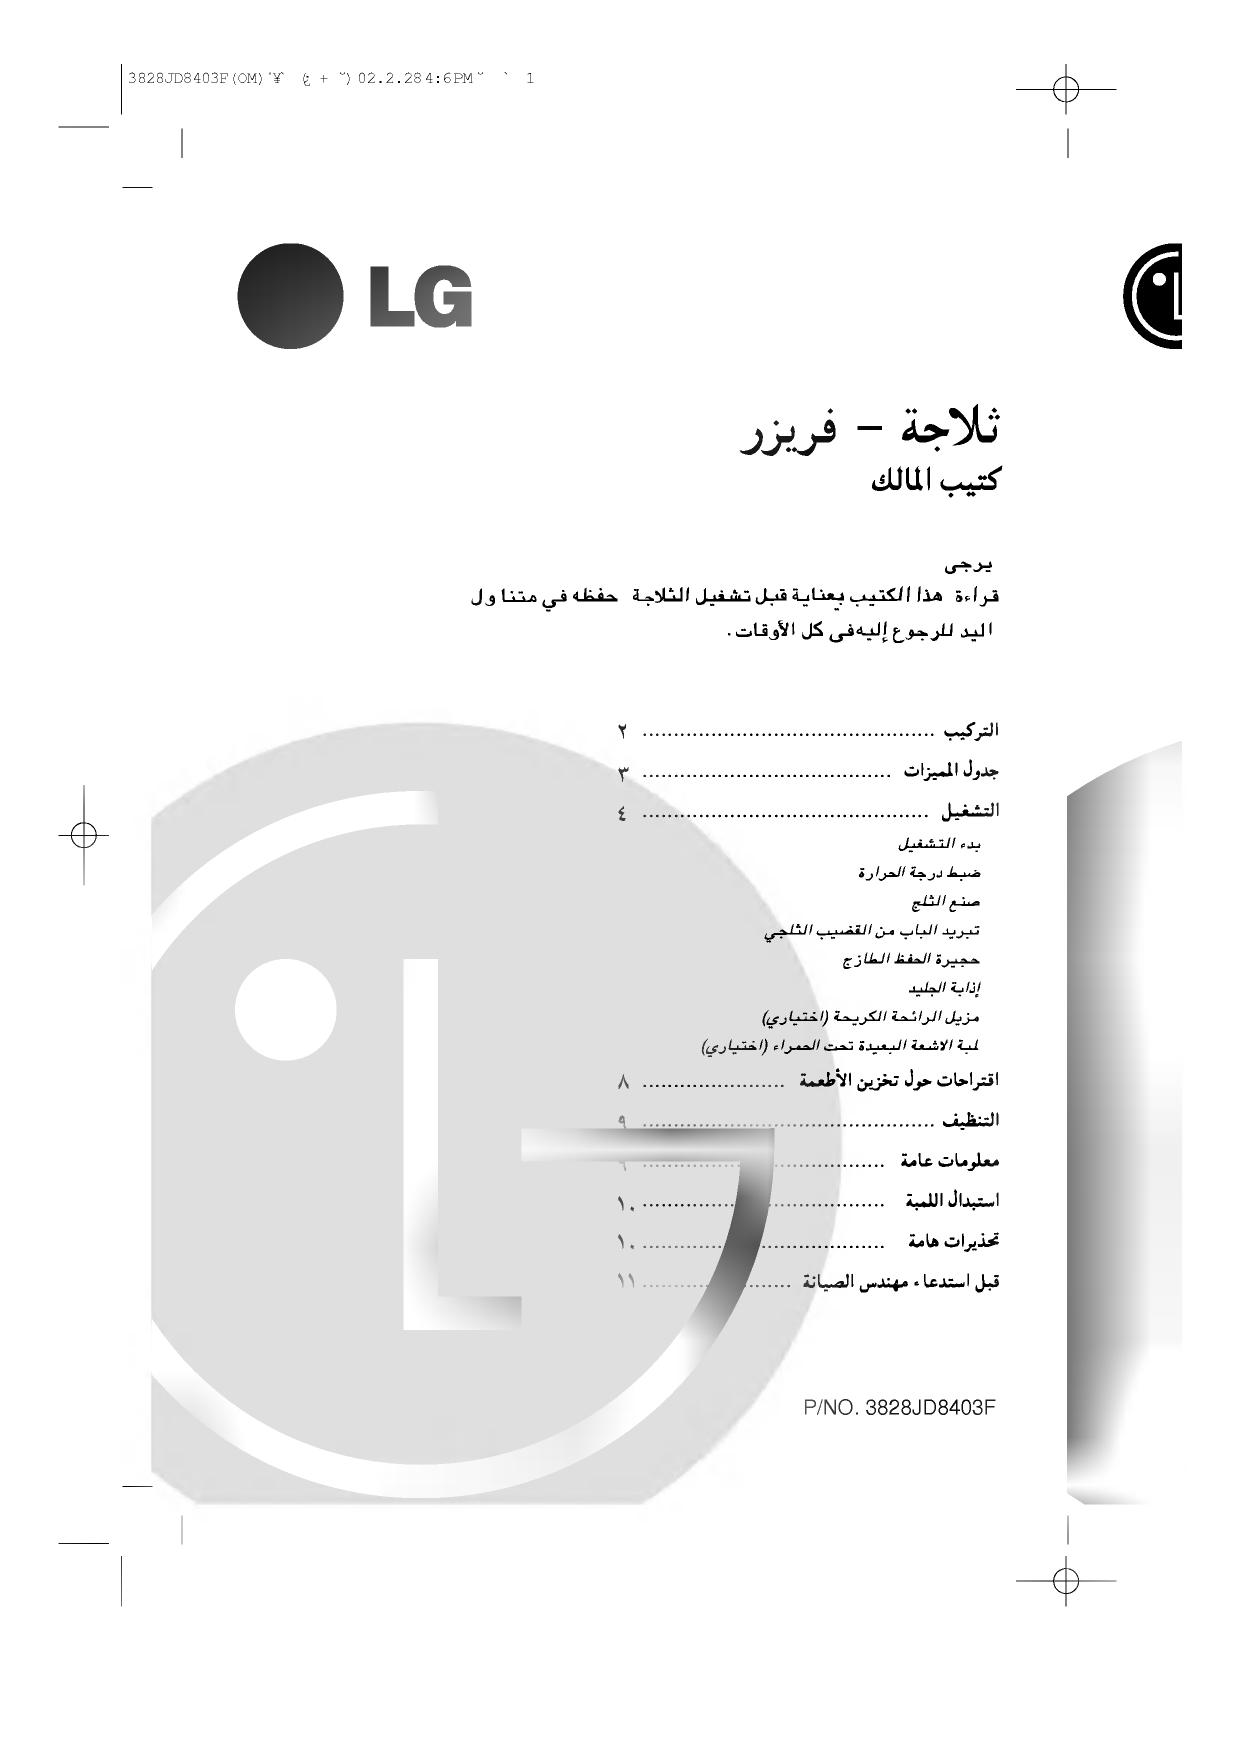 LG GR-S512QLC Instrukcja obsługi | manualzz.com on